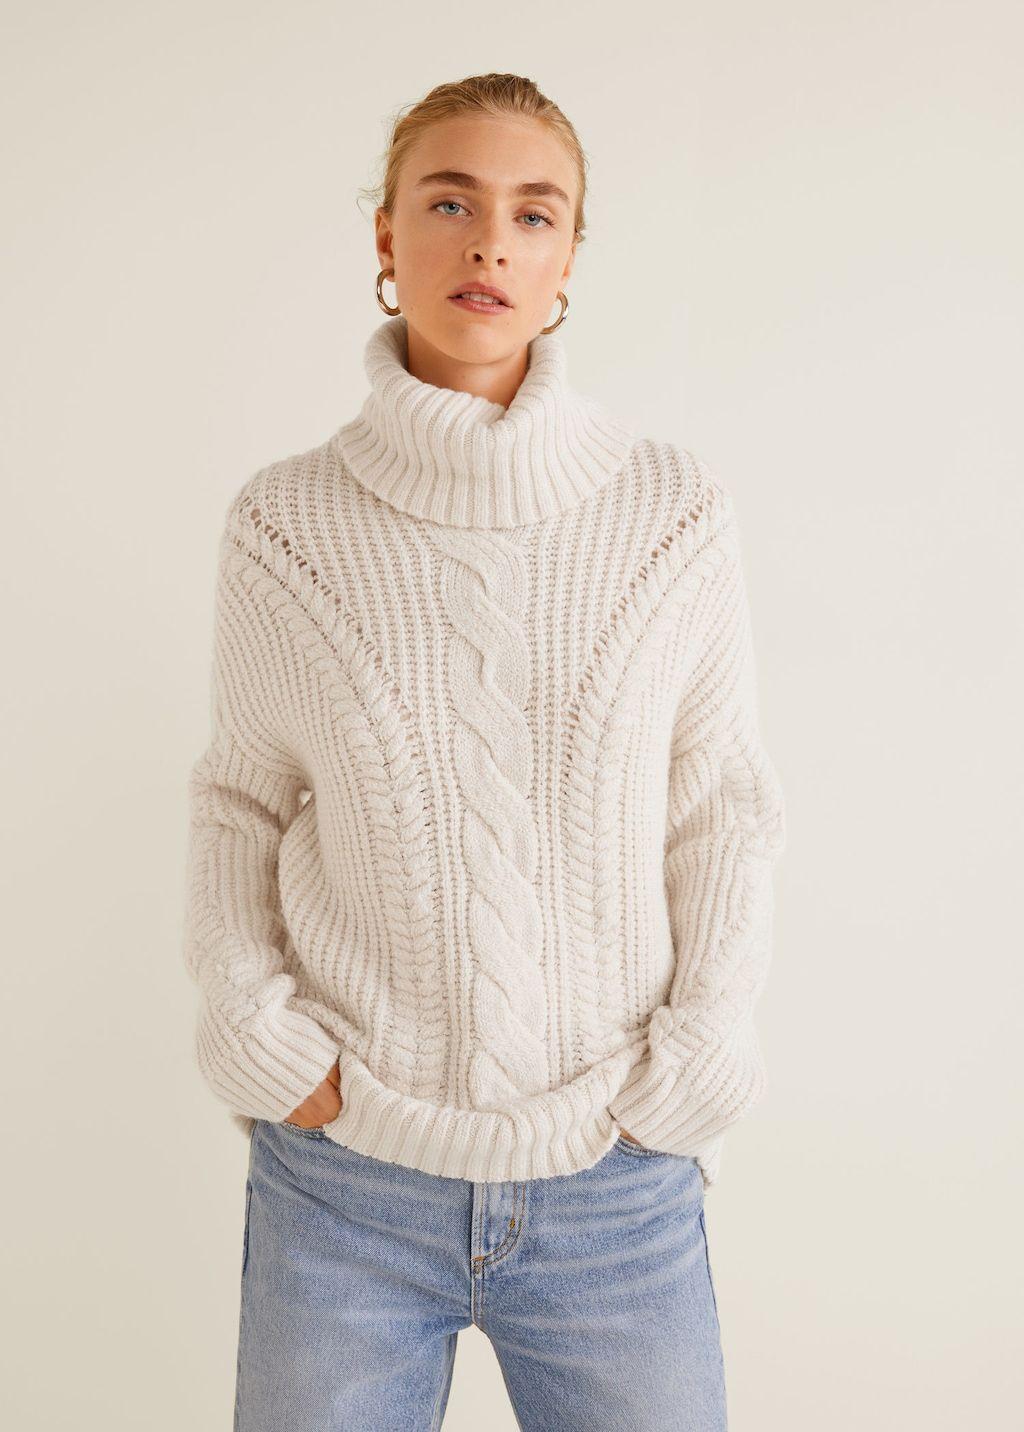 2fd49436701 Джемпер крупной вязки - Кардиганы и свитеры - Женская